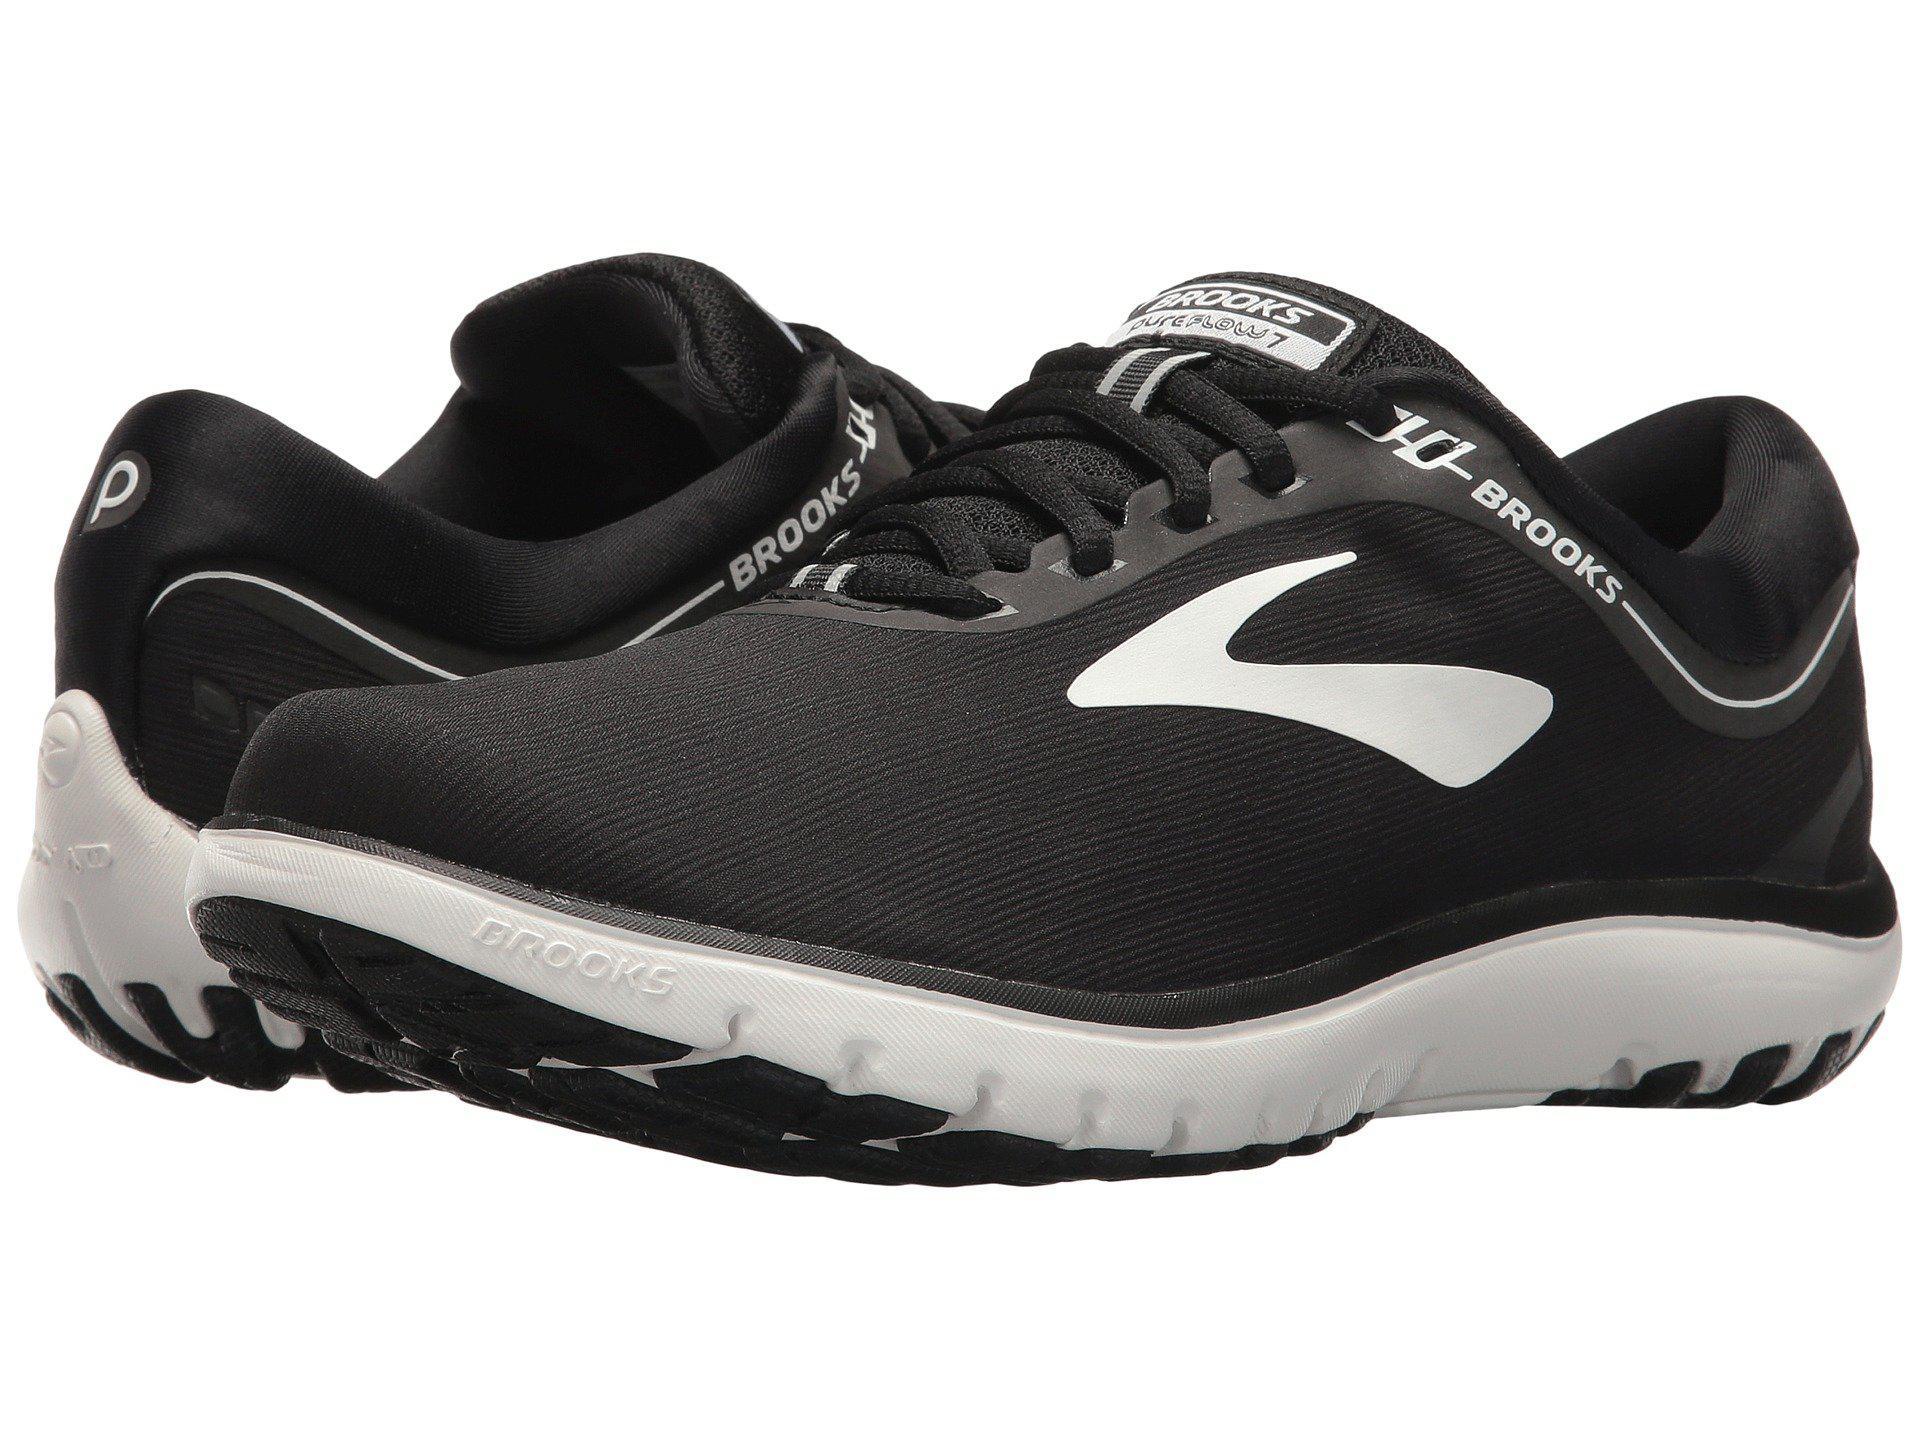 4f79931e34401 Lyst - Brooks Pureflow 7 (grey black green) Women s Running Shoes in ...